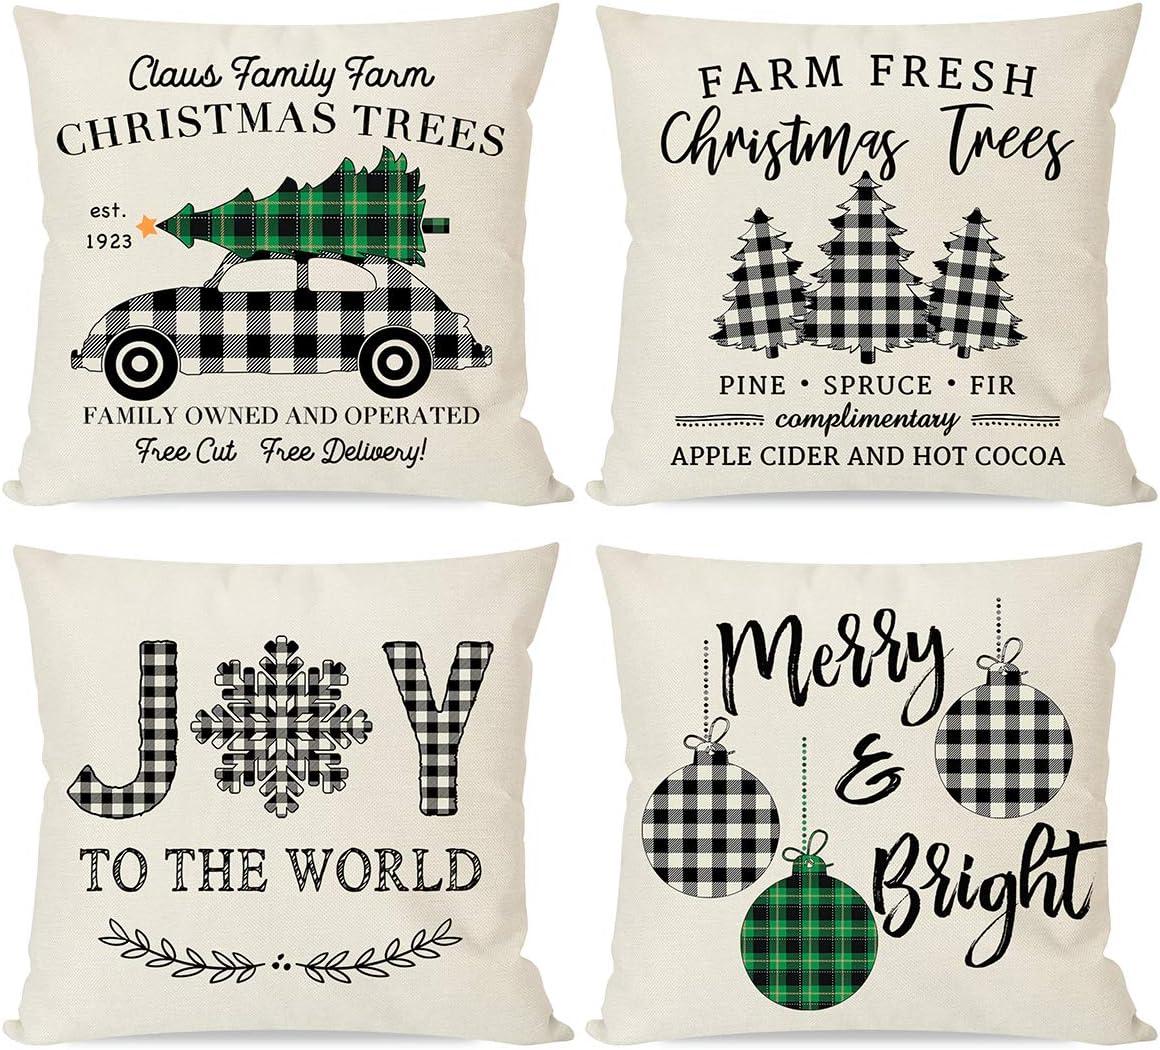 PANDICORN Buffalo Plaid Christmas Pillow Covers 18x18 Set of 4, Farmhouse Christmas Throw Pillows Cases for Home Outdoor Christmas Decorations, Buffalo Check Christmas Decor Trees Truck Ornaments